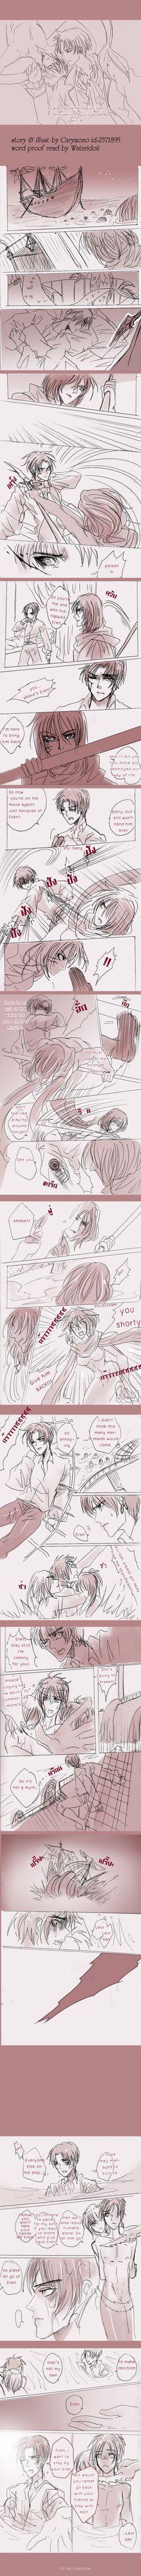 SnK'AU : Pirate!Levi x Mermaid!Eren part13 by illuscarymono.deviantart.com on @DeviantArt